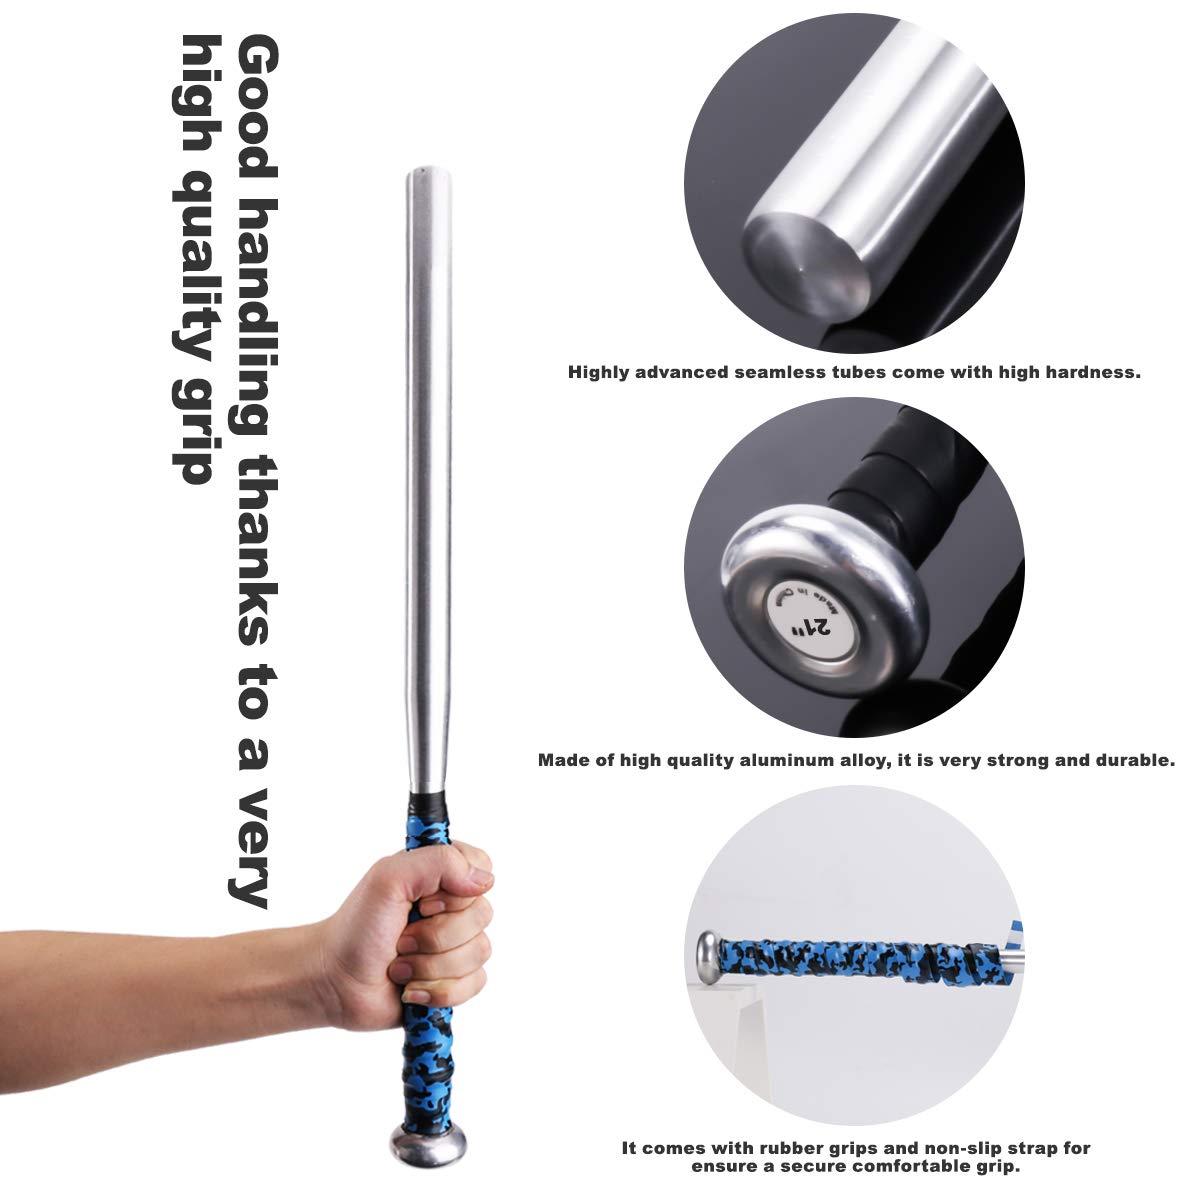 Caretoo Bate de b/éisbol de aleaci/ón de aluminio de color plateado grueso palo de b/éisbol barra casa en 21//31 pulgadas